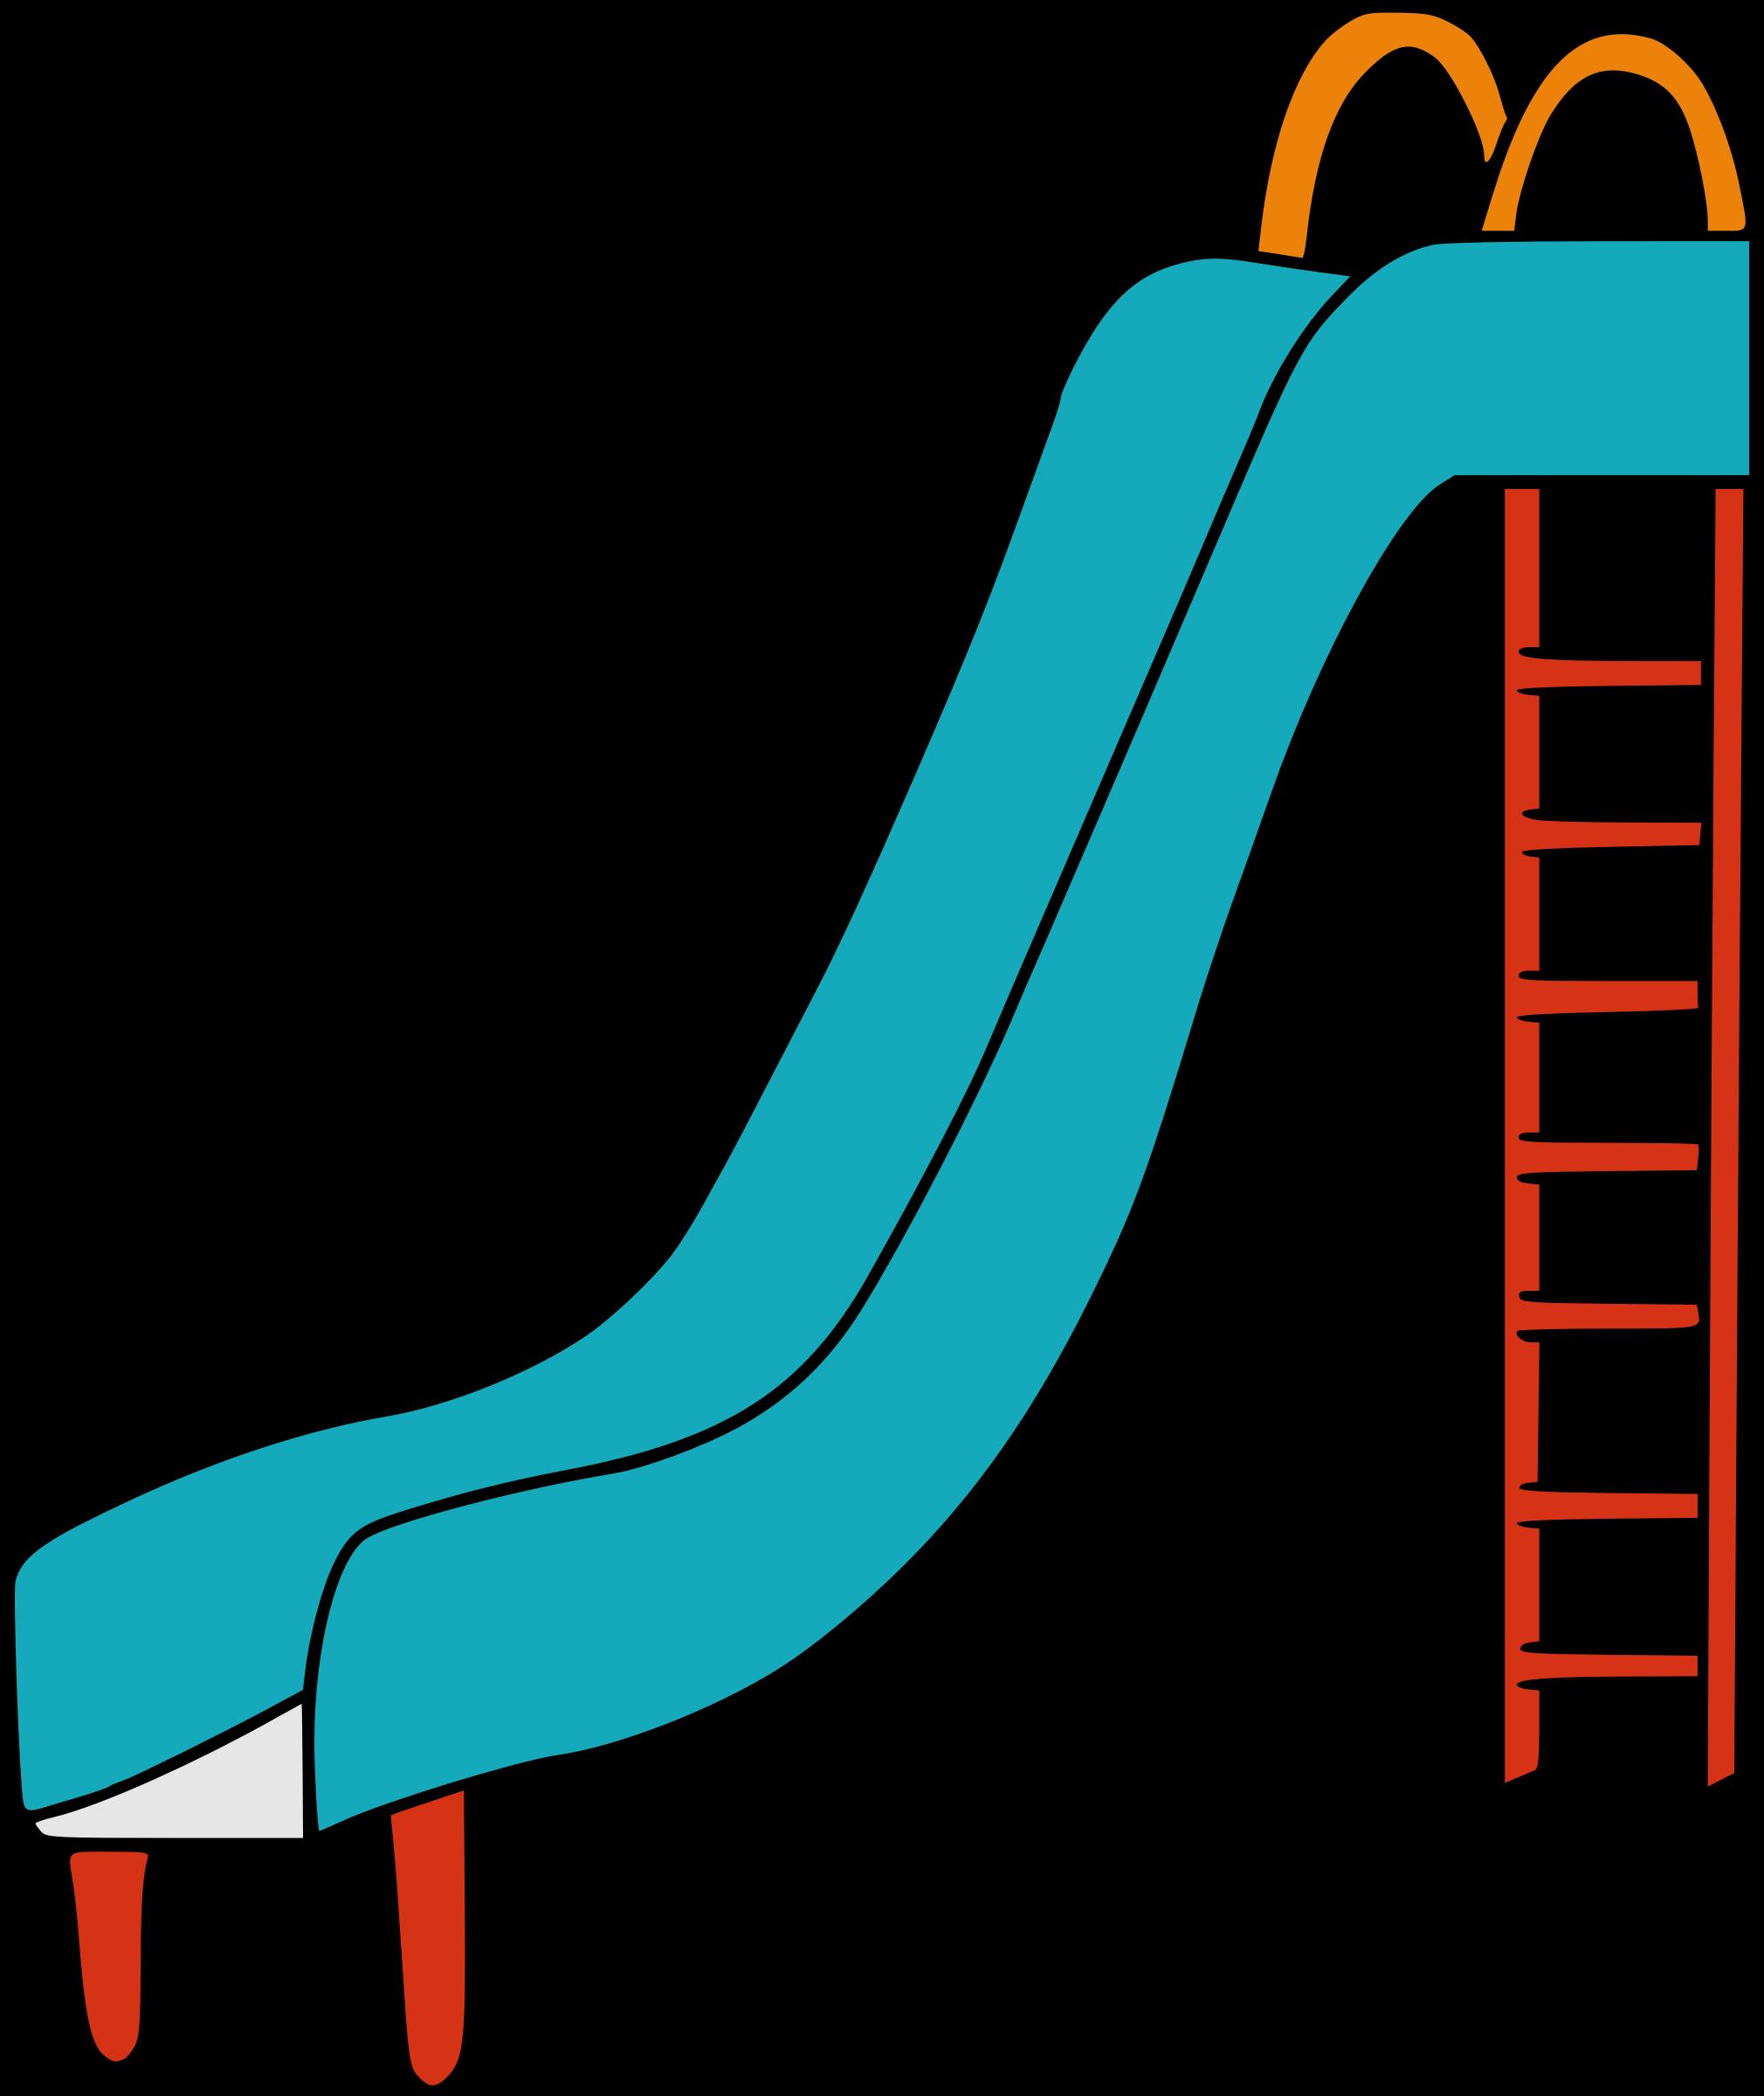 Clipart Playground Slide 3